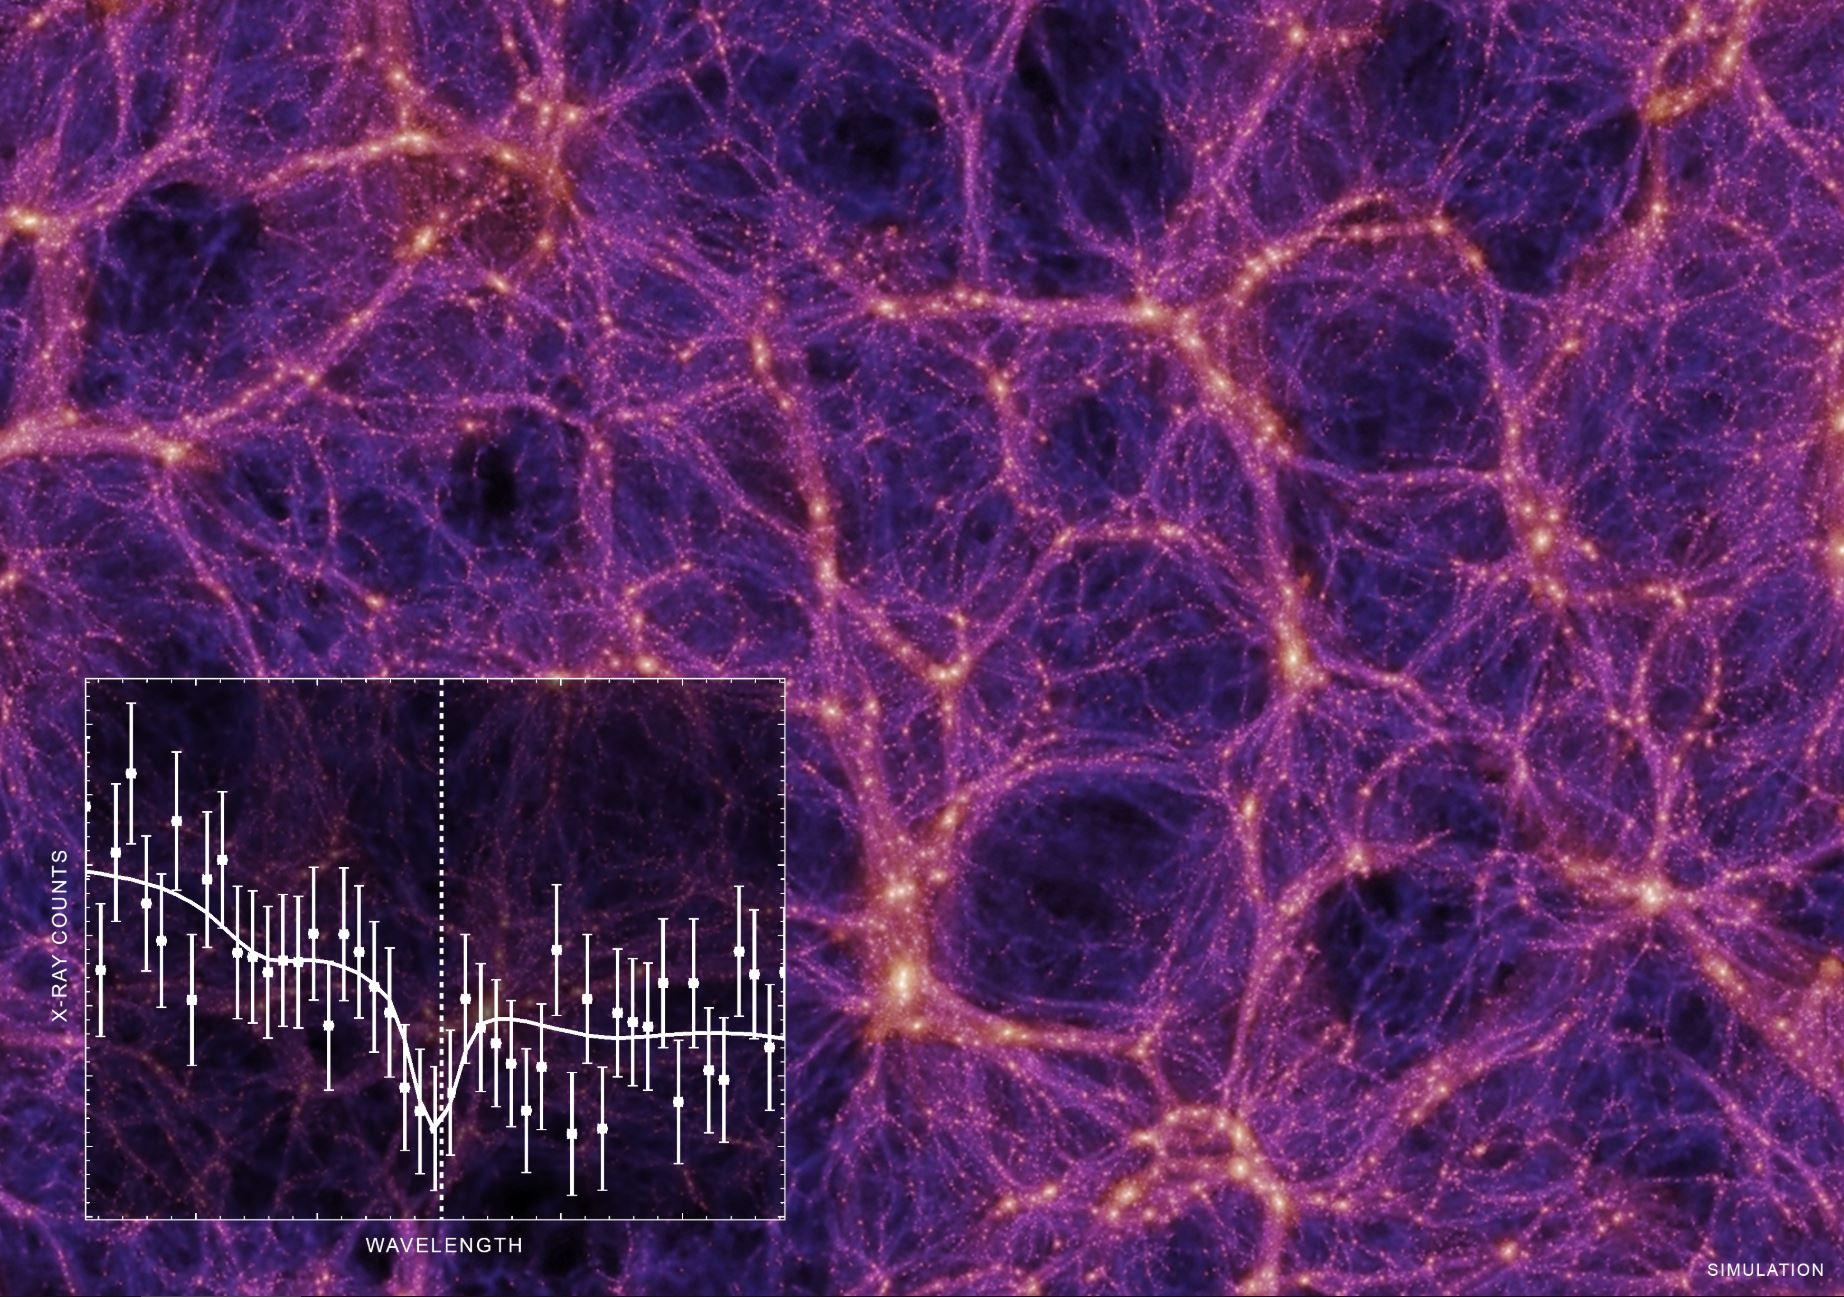 Image Credit: Illustration: Springel et al. (2005); Spectrum: NASA/CXC/CfA/Kovács et al.  -  Read full caption